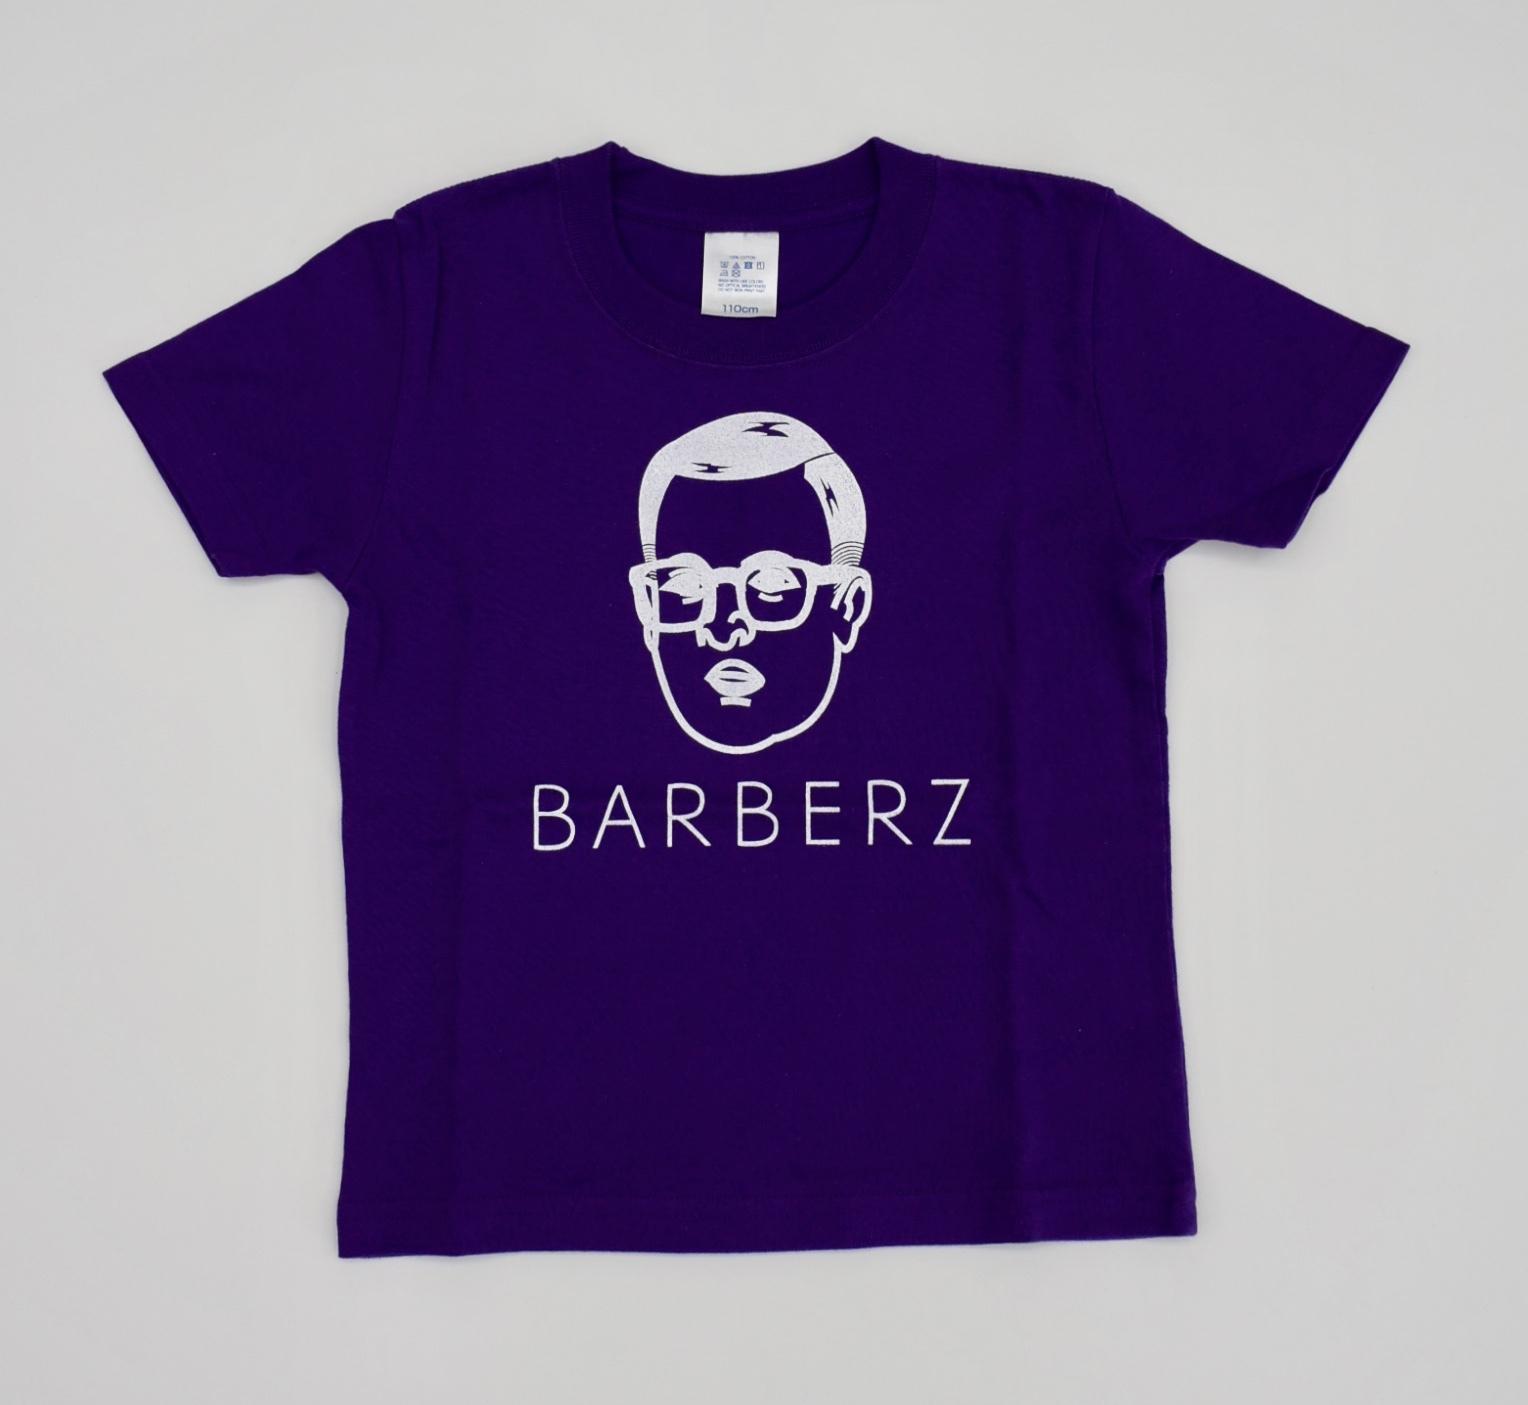 BARBERZ 刈り上げおじさんキッズTシャツ サイズ110